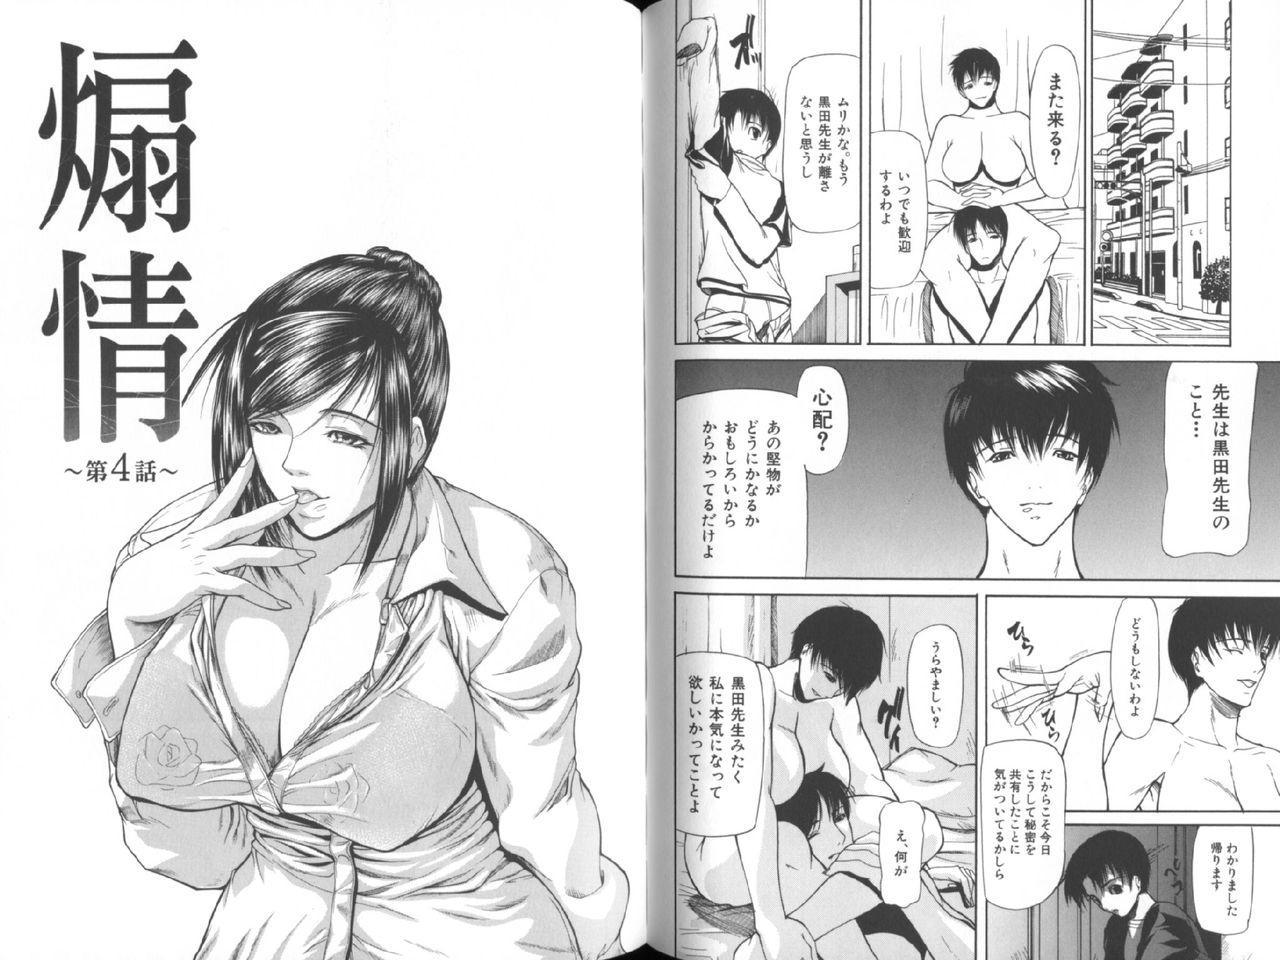 Senjou - A Desire is Instigated 34